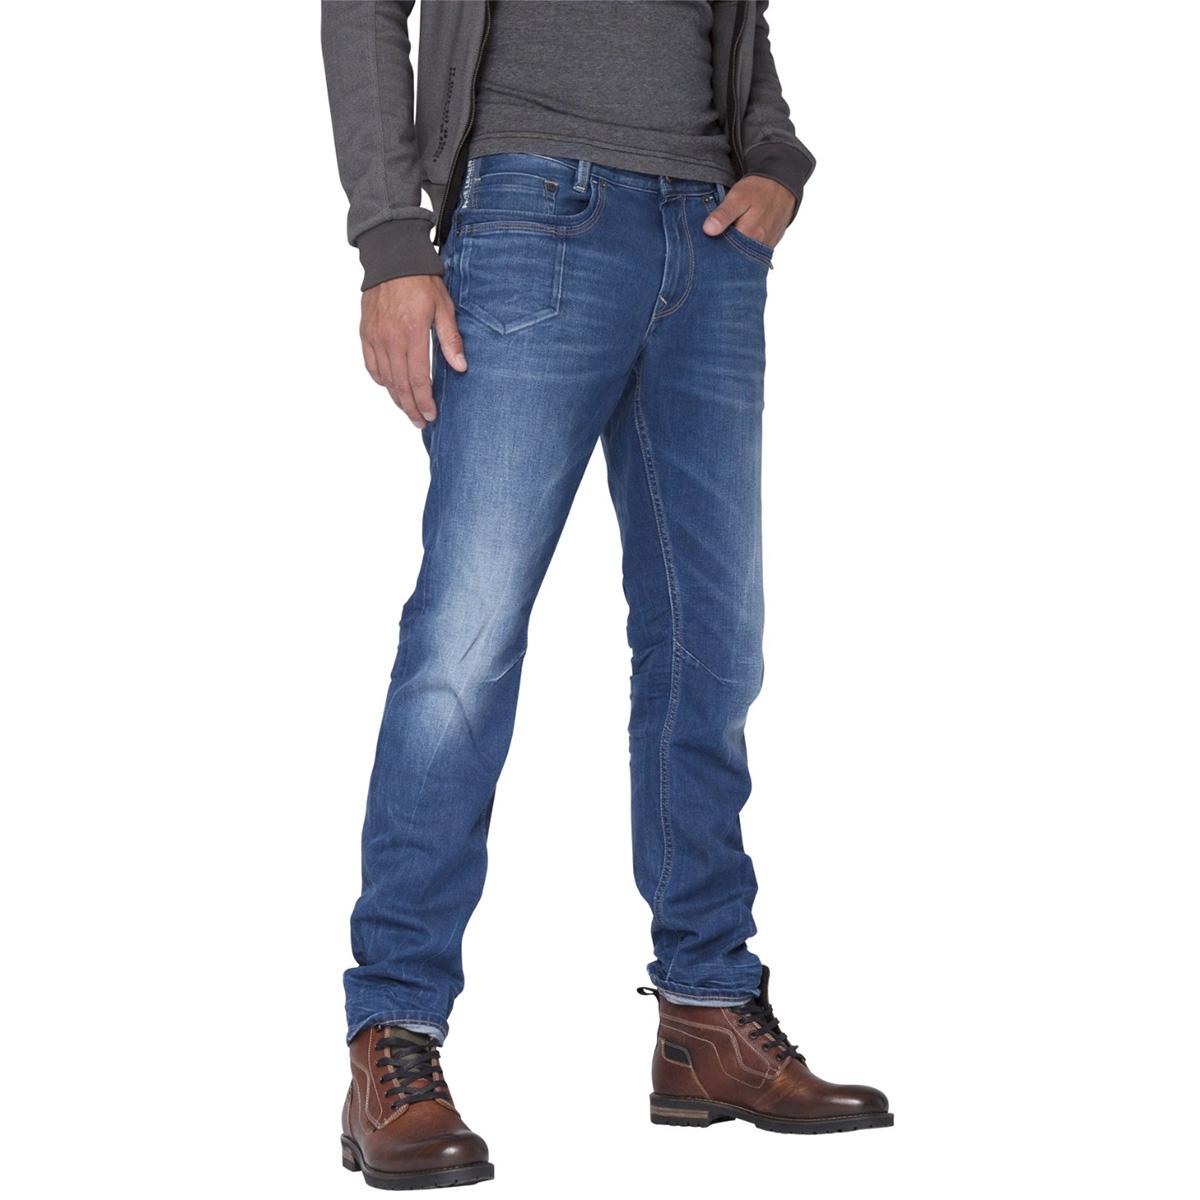 skymaster ptr650 pme legend jeans mbu